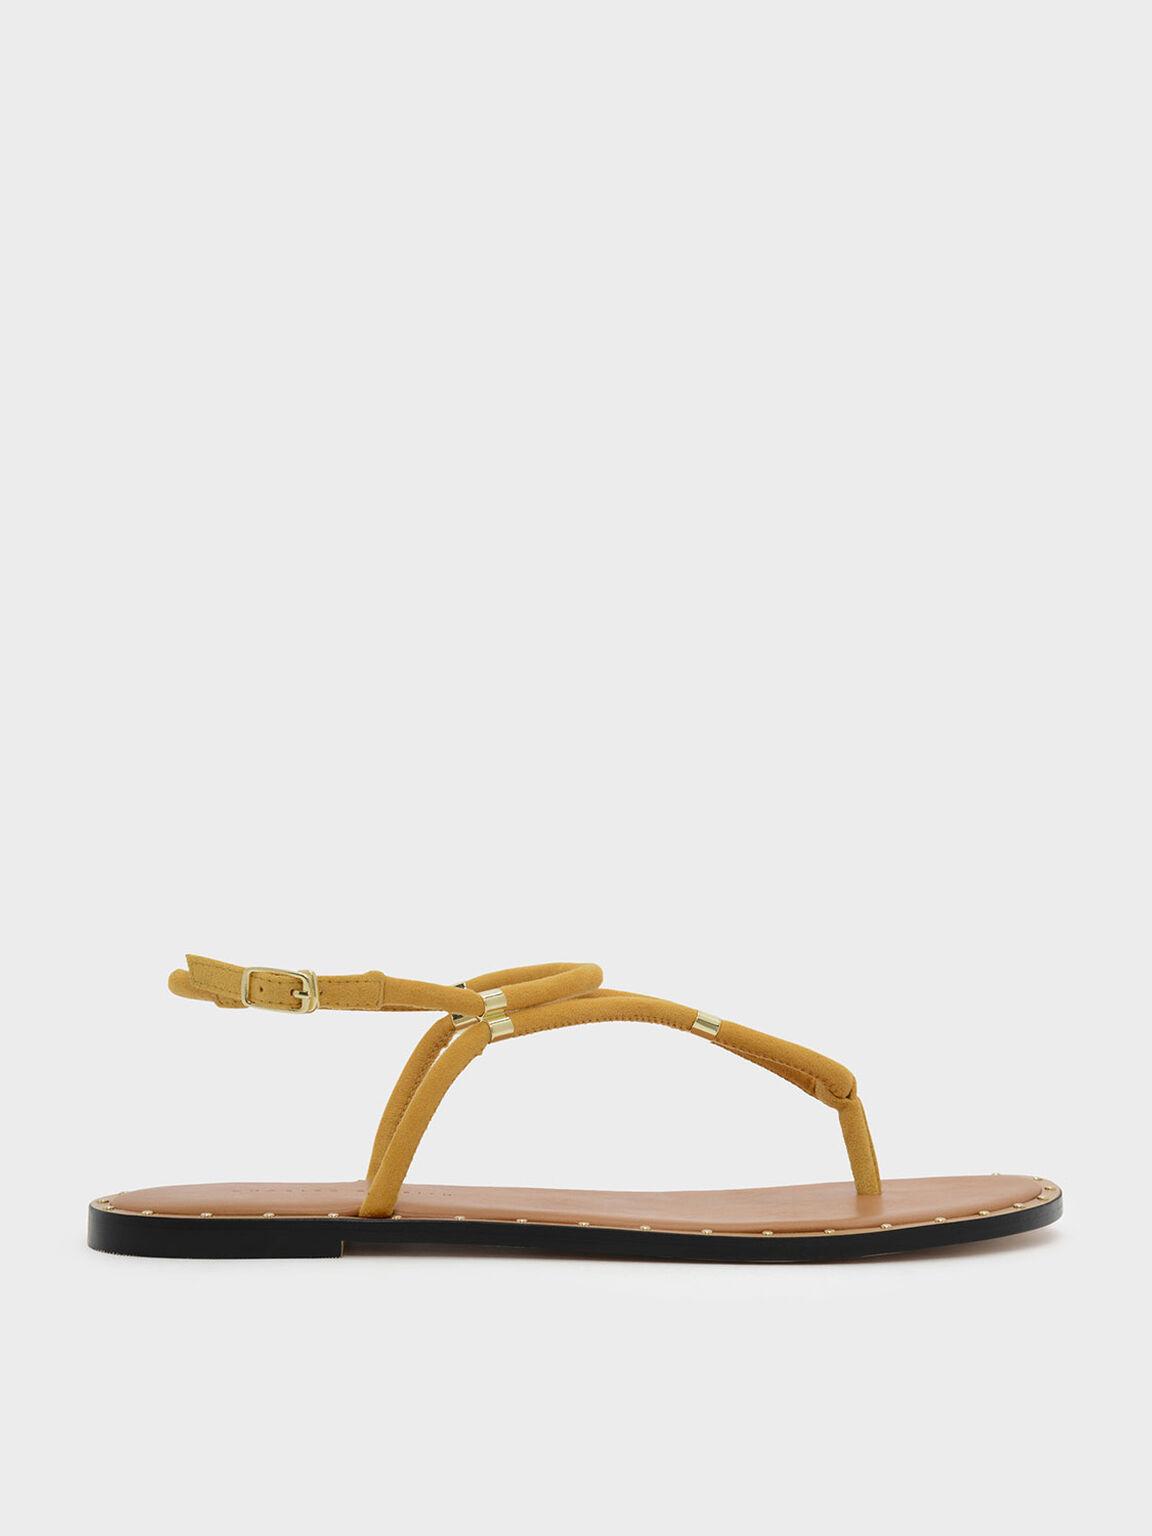 夾腳平底涼鞋, 黃色, hi-res